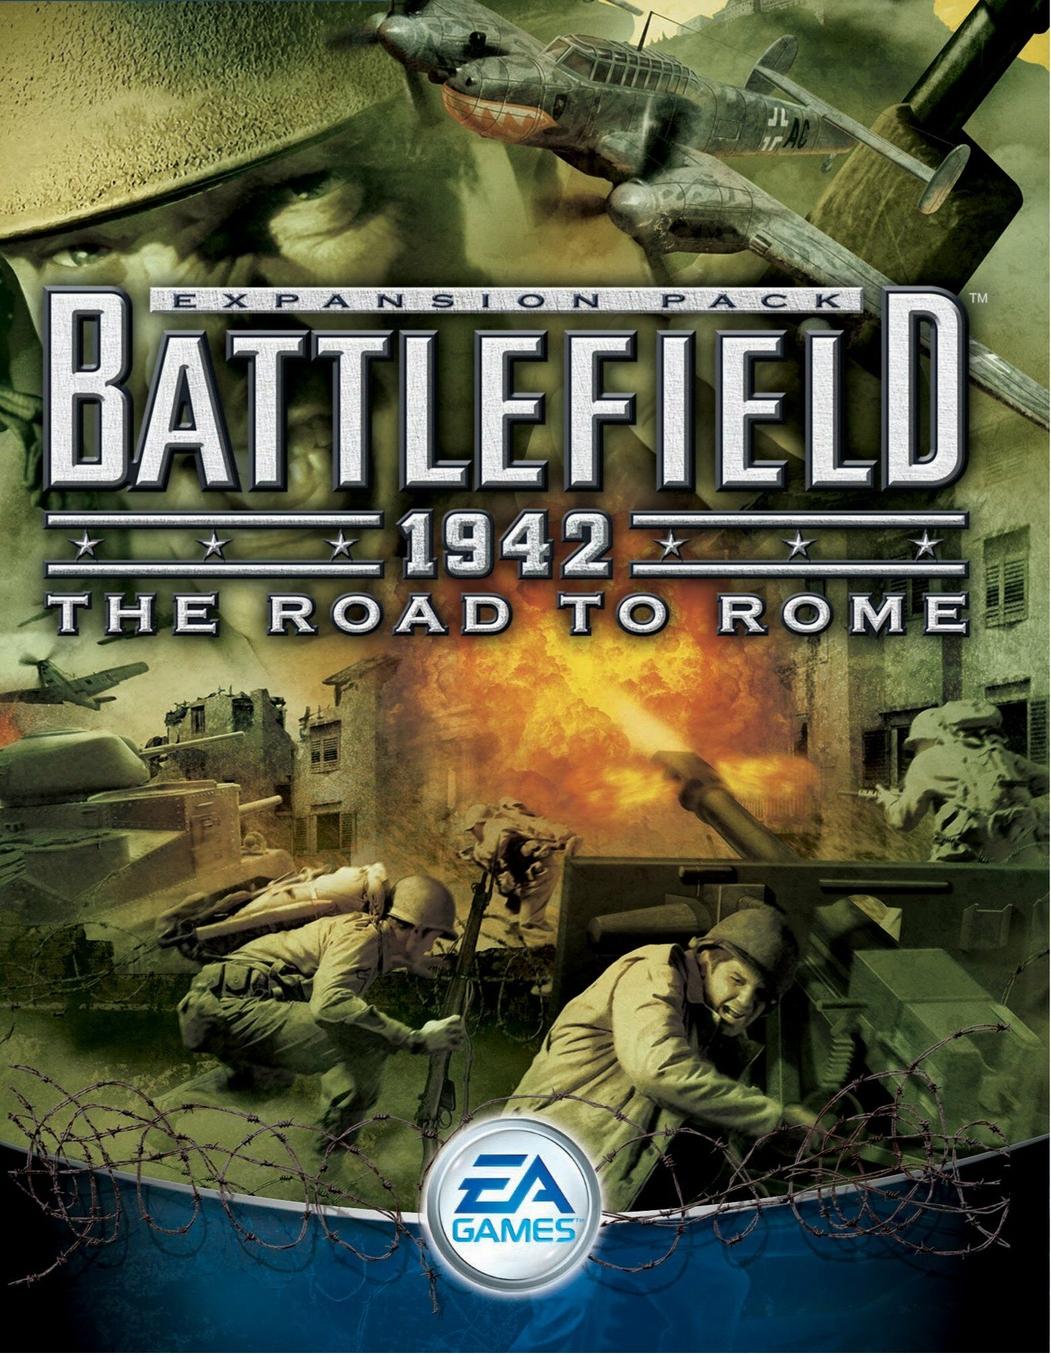 Battlefield 1942 cd -